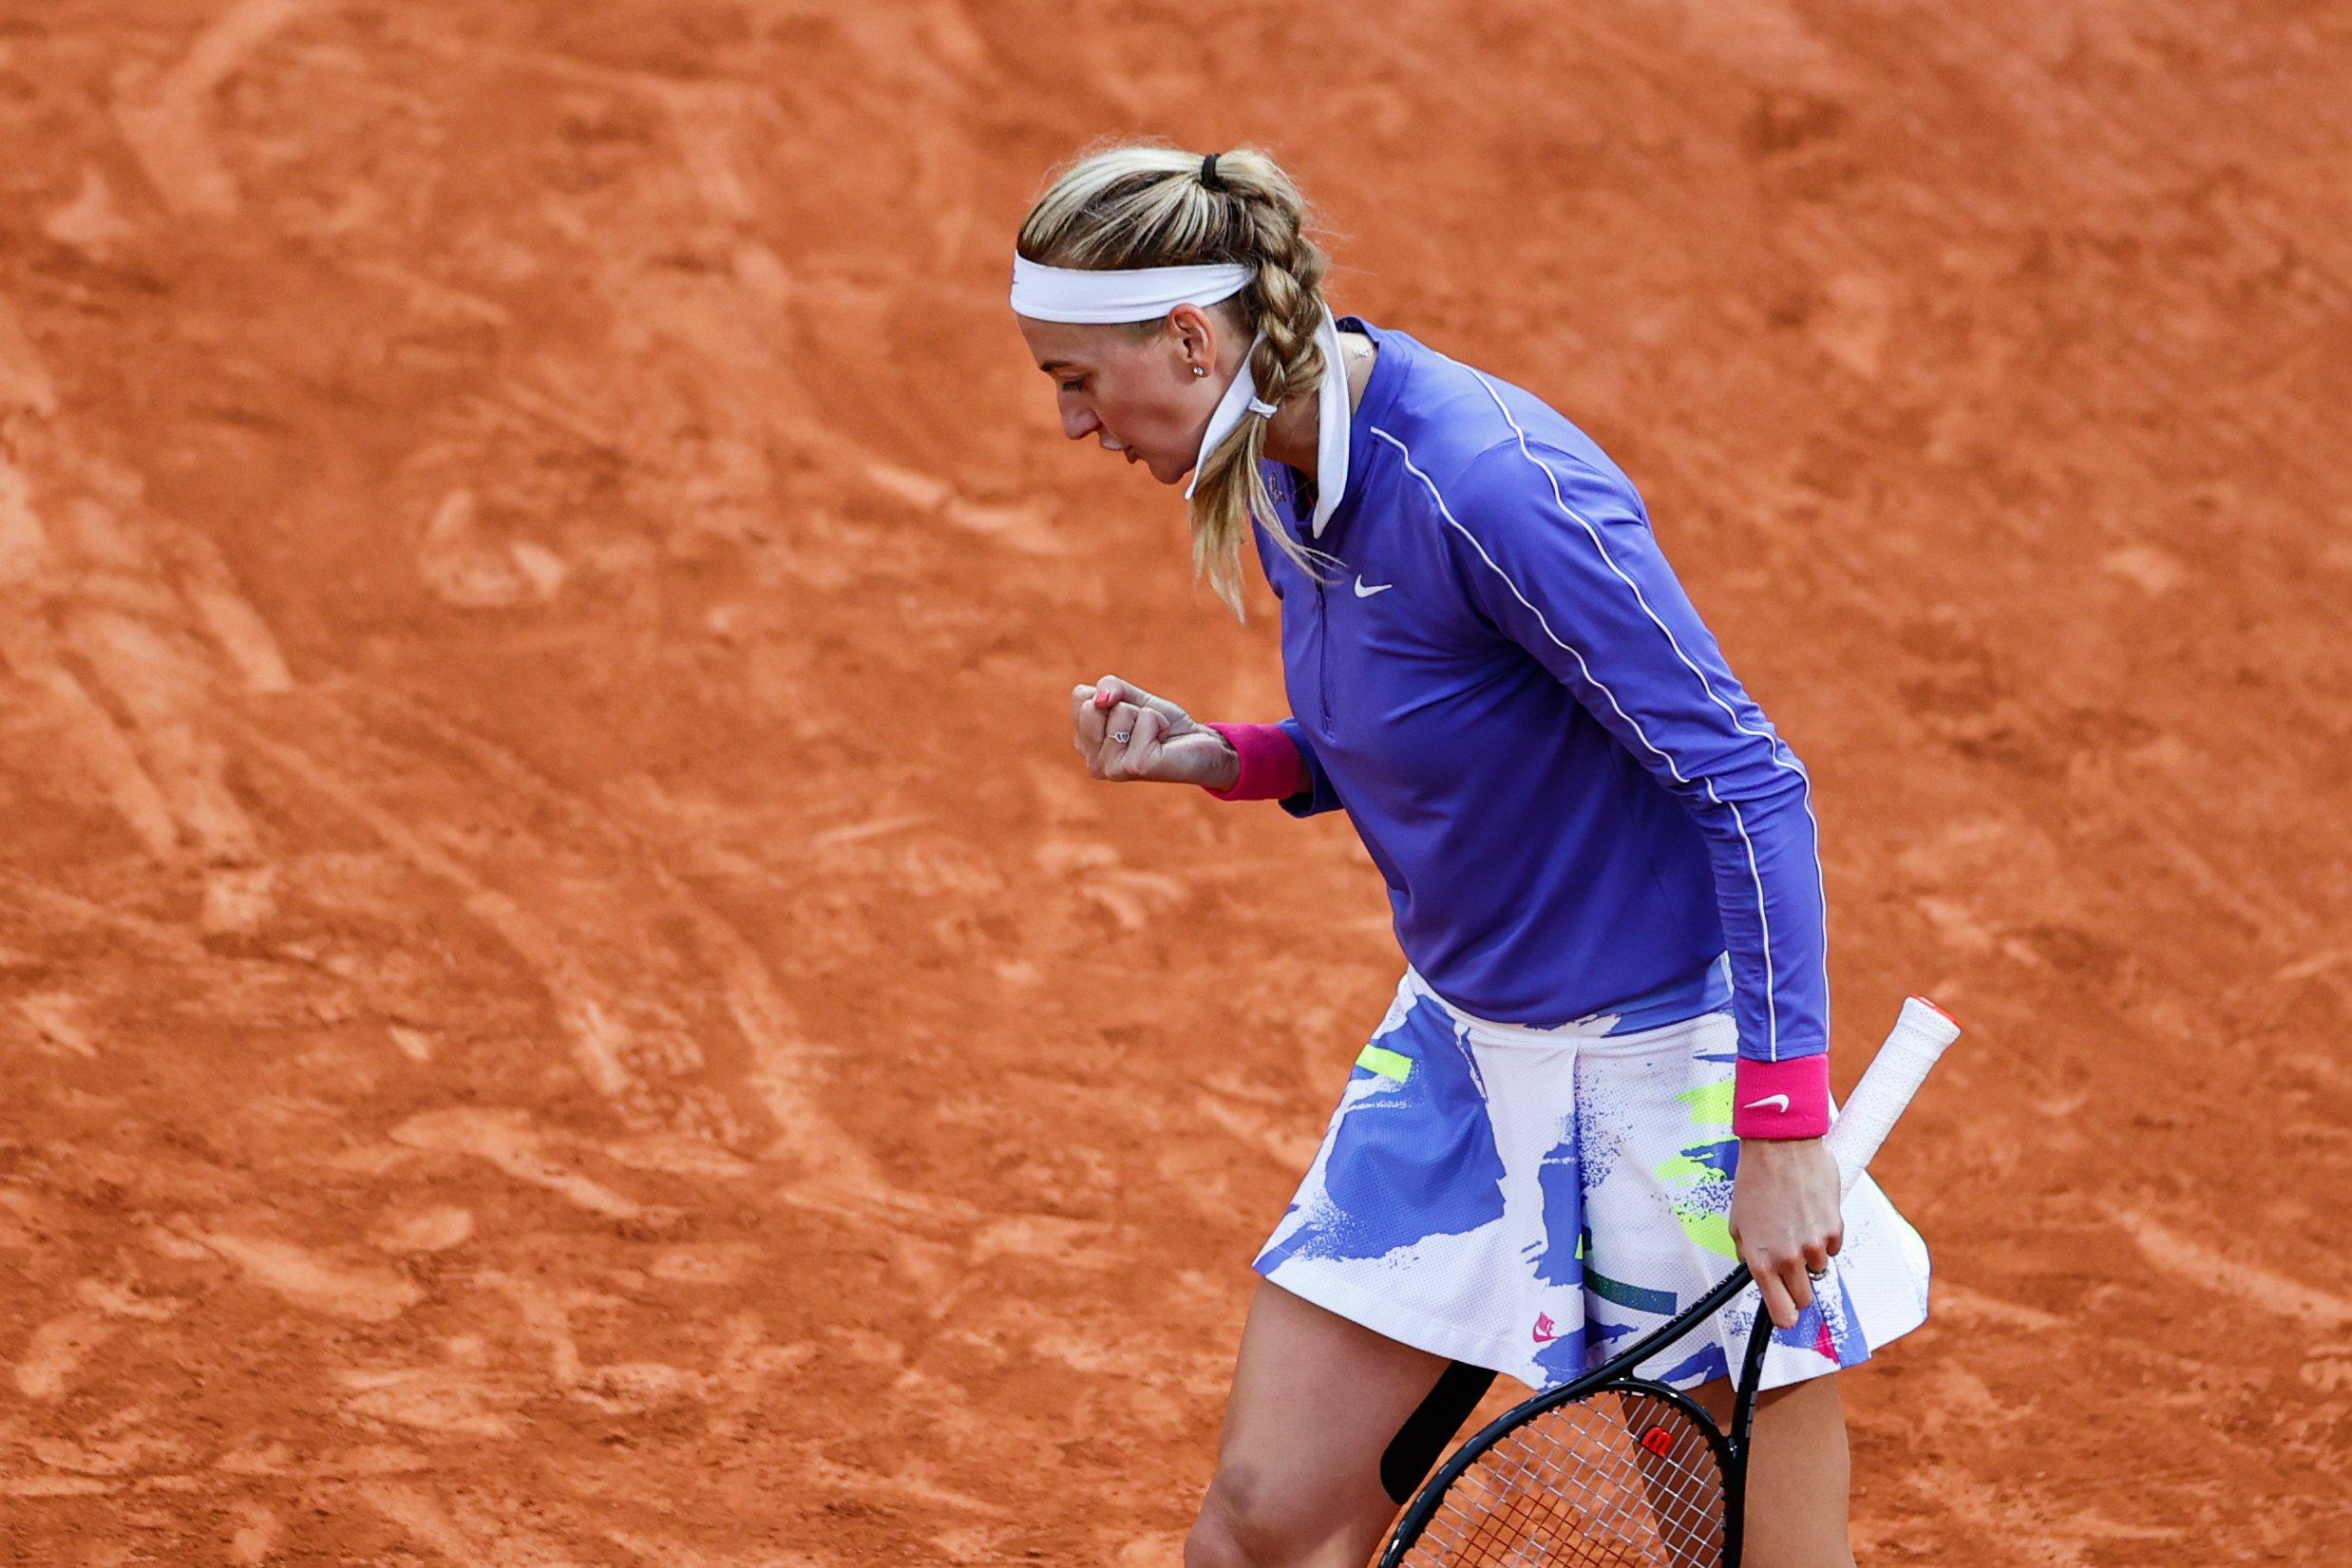 Madryt.Kvitova i Bencic pierwszymi ćwierćfinalistkami